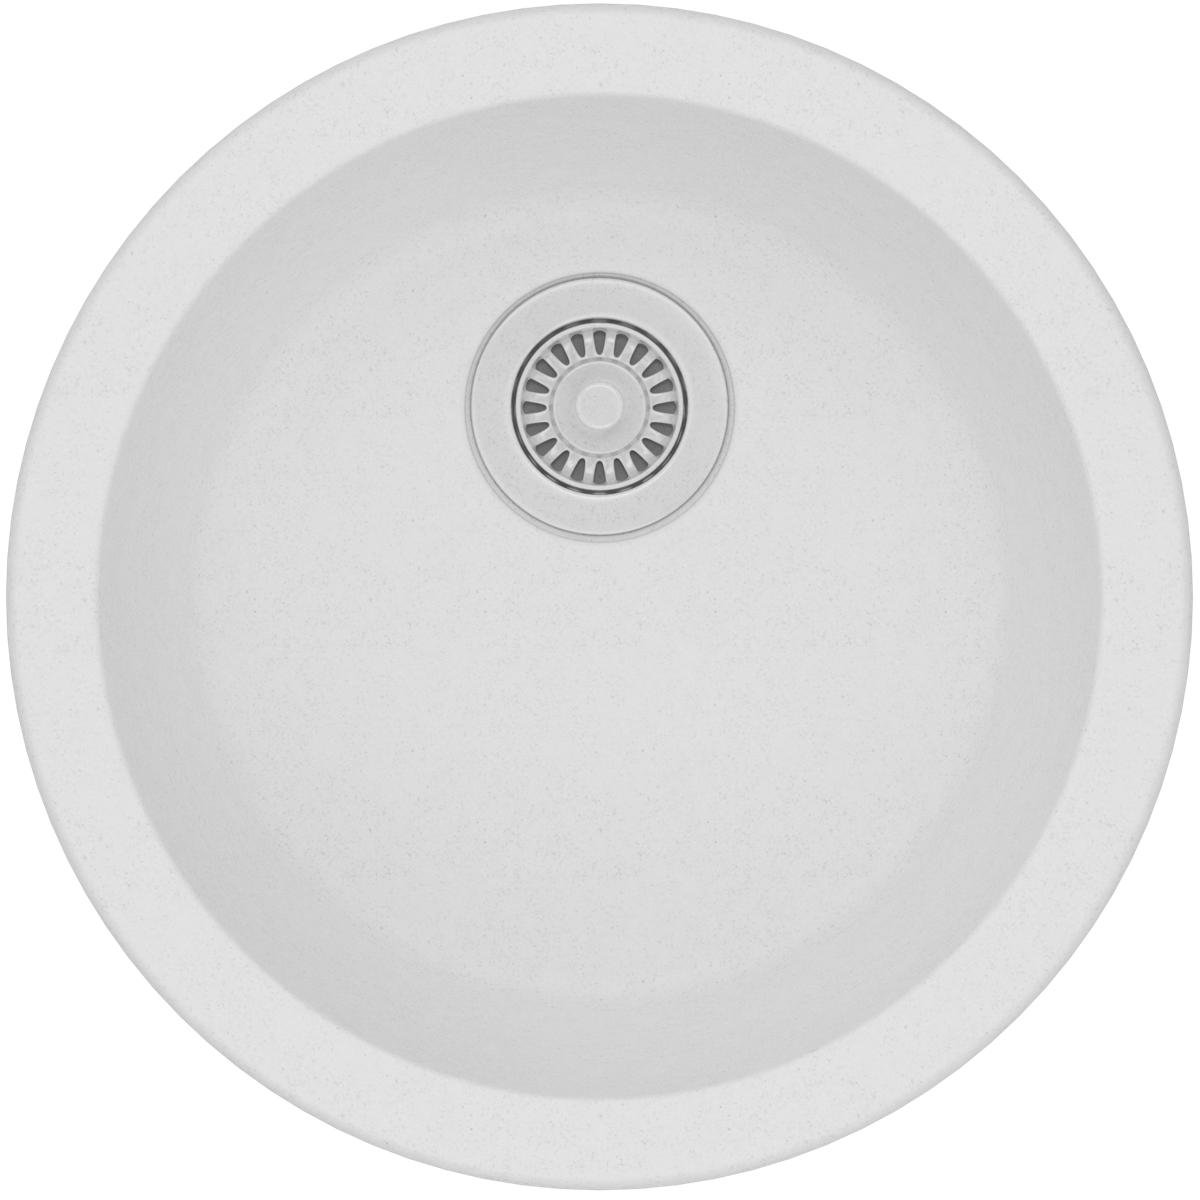 Elkay Quartz Classic ELG16FBWH0 White Single Bowl Dual Mount Bar Sink